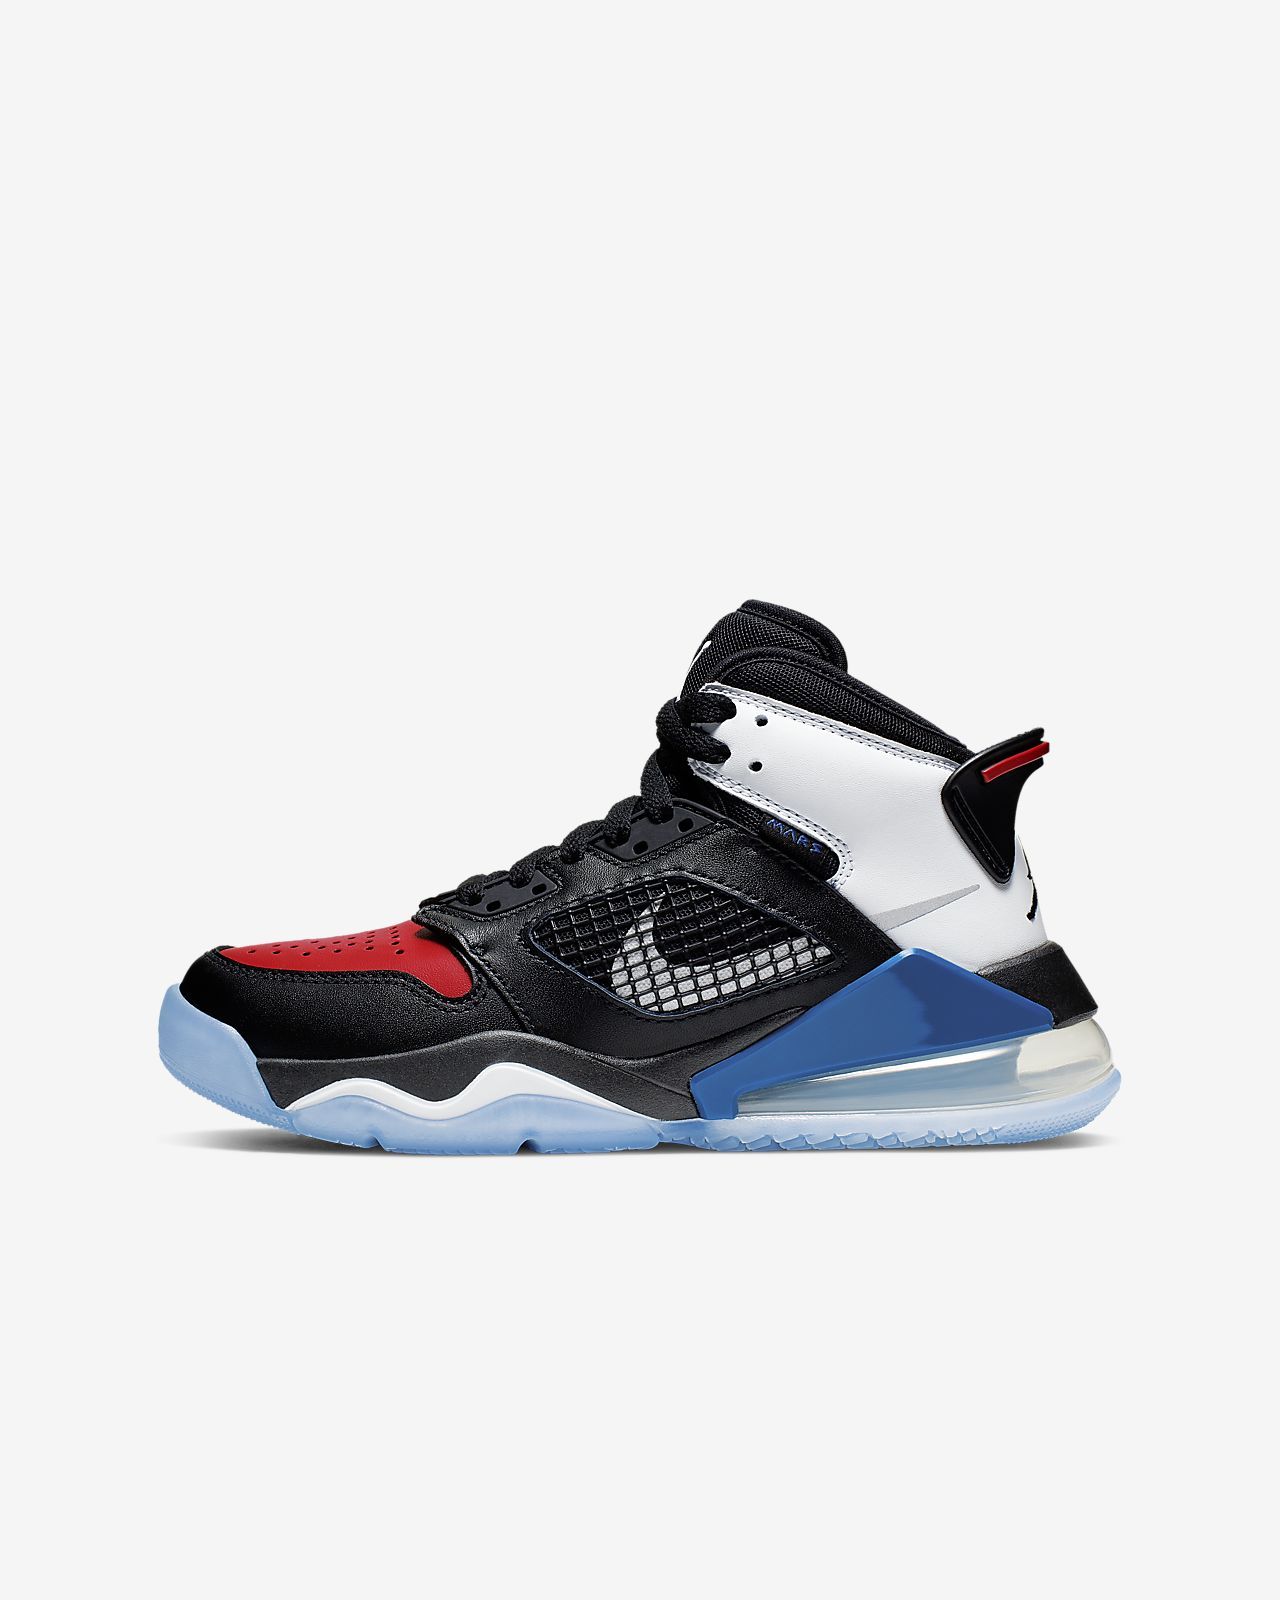 Jordan Mars 270-sko til store børn